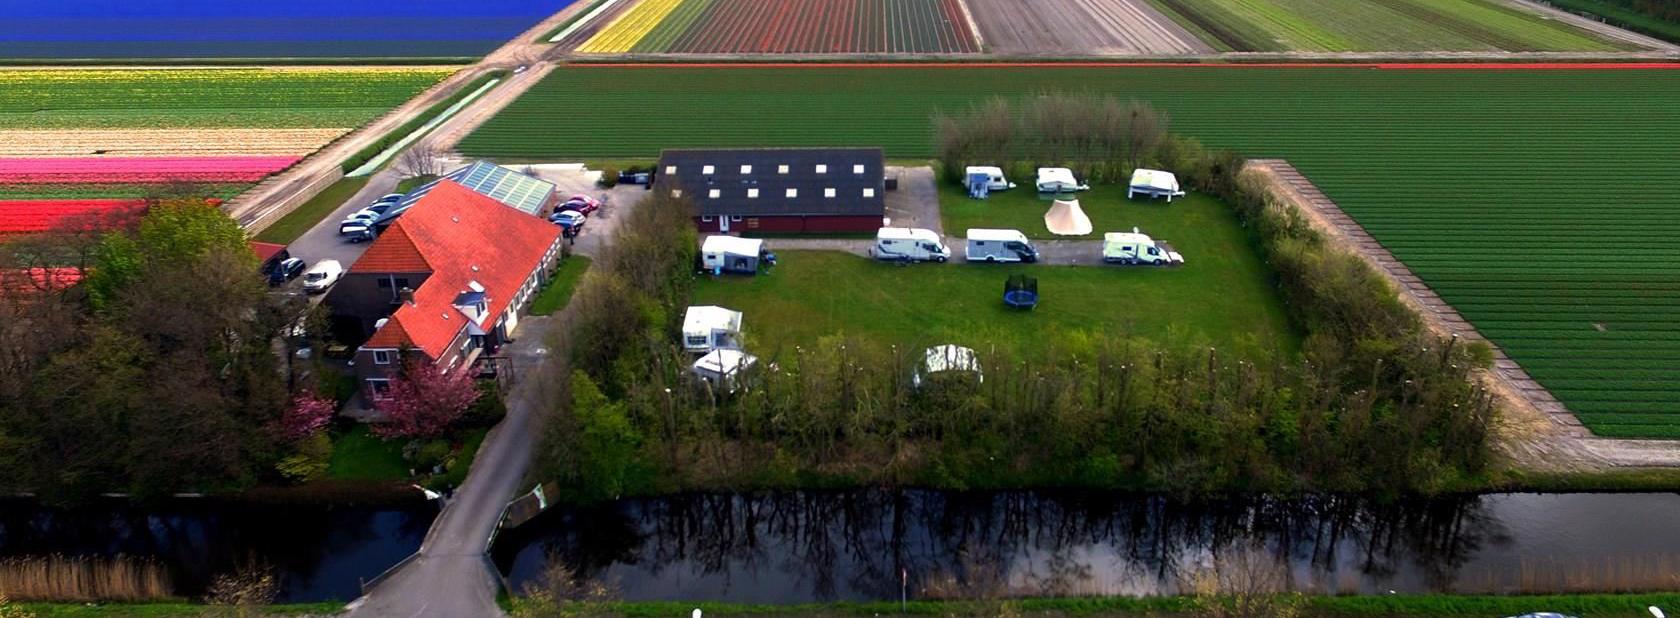 SVR Campings Nederland